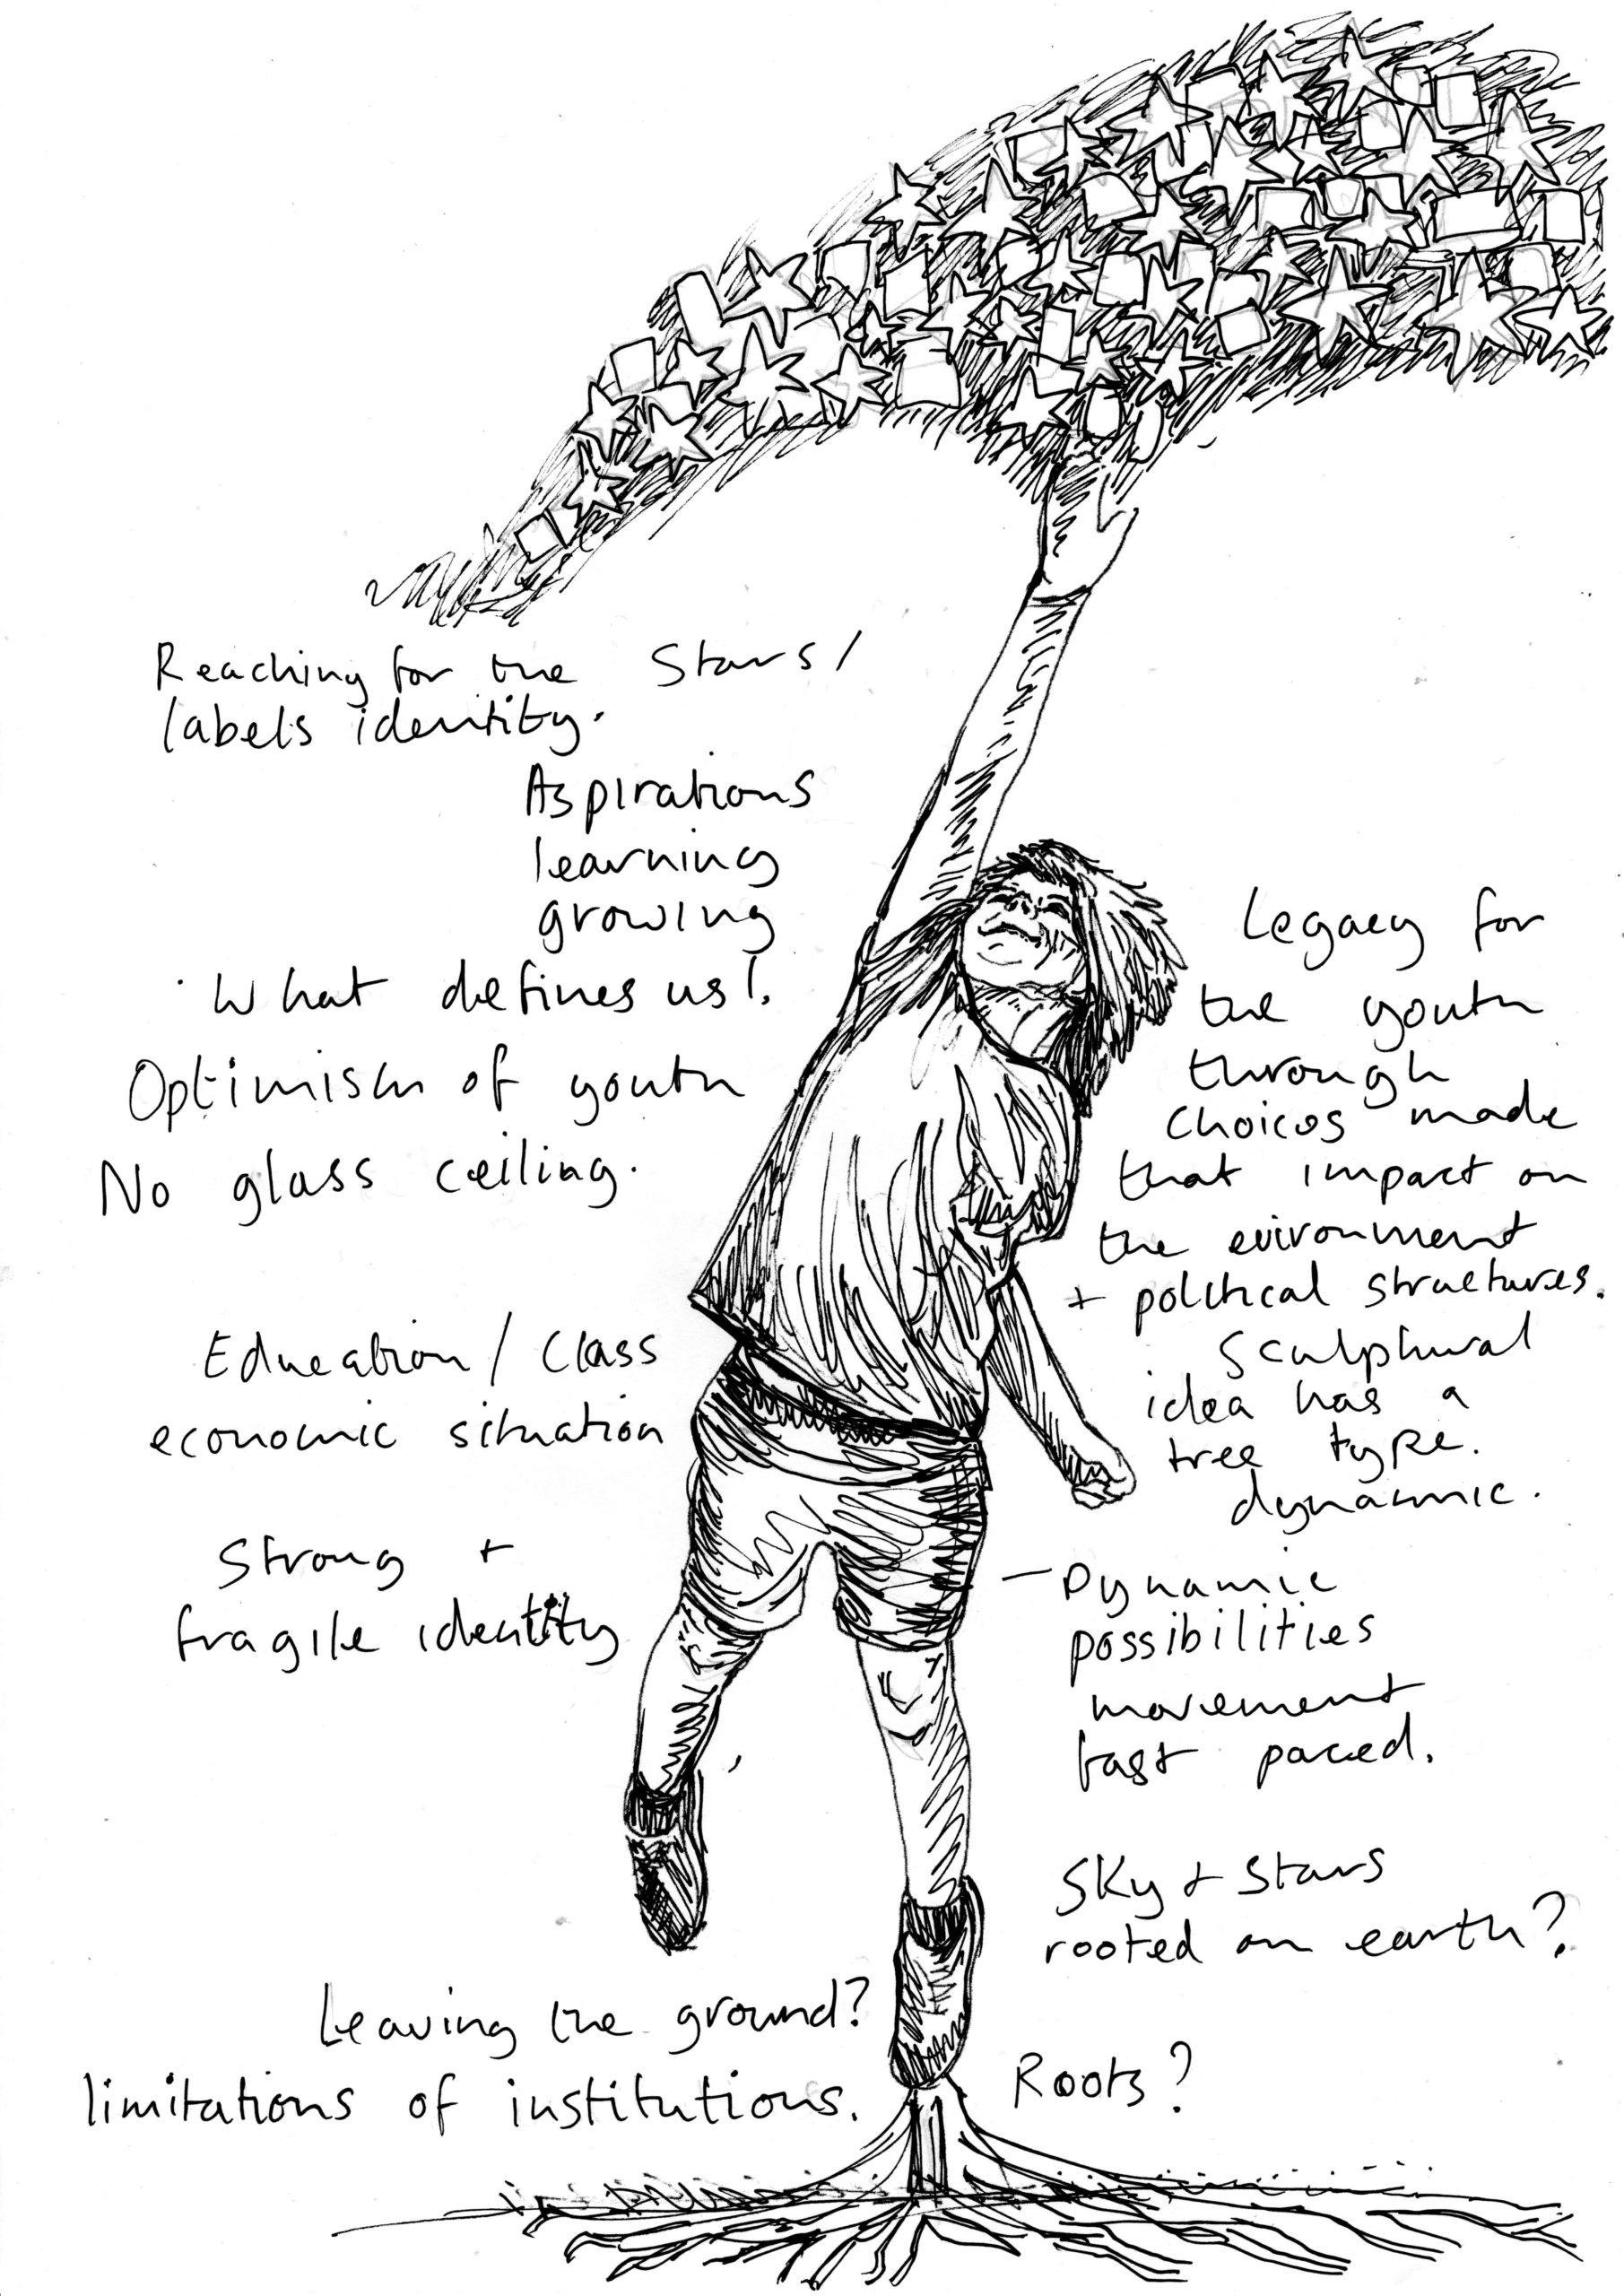 Youth Sketch. James lake